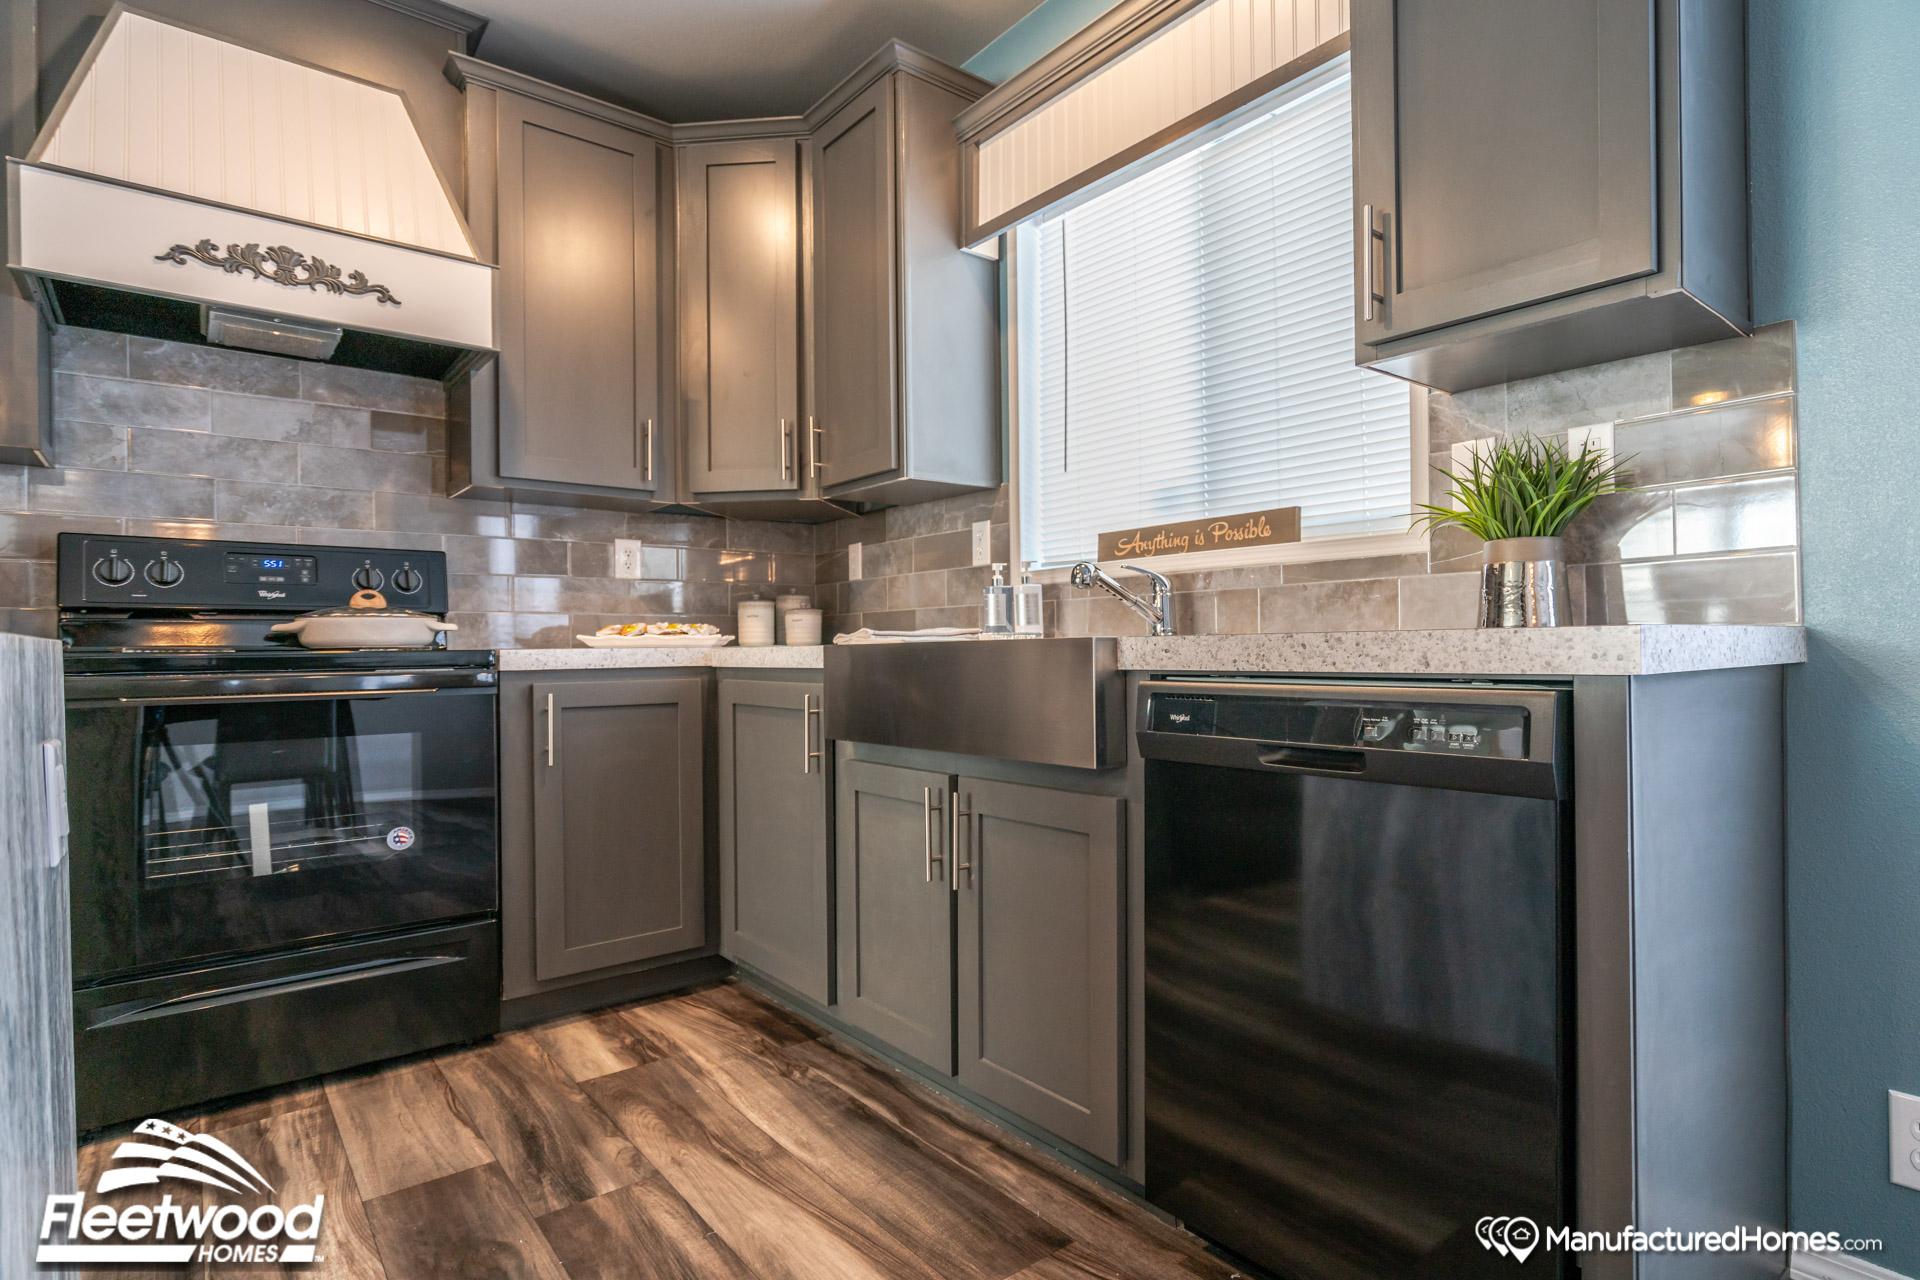 Fleetwood Homes Of Nampa Idaho Manufactured And Modular